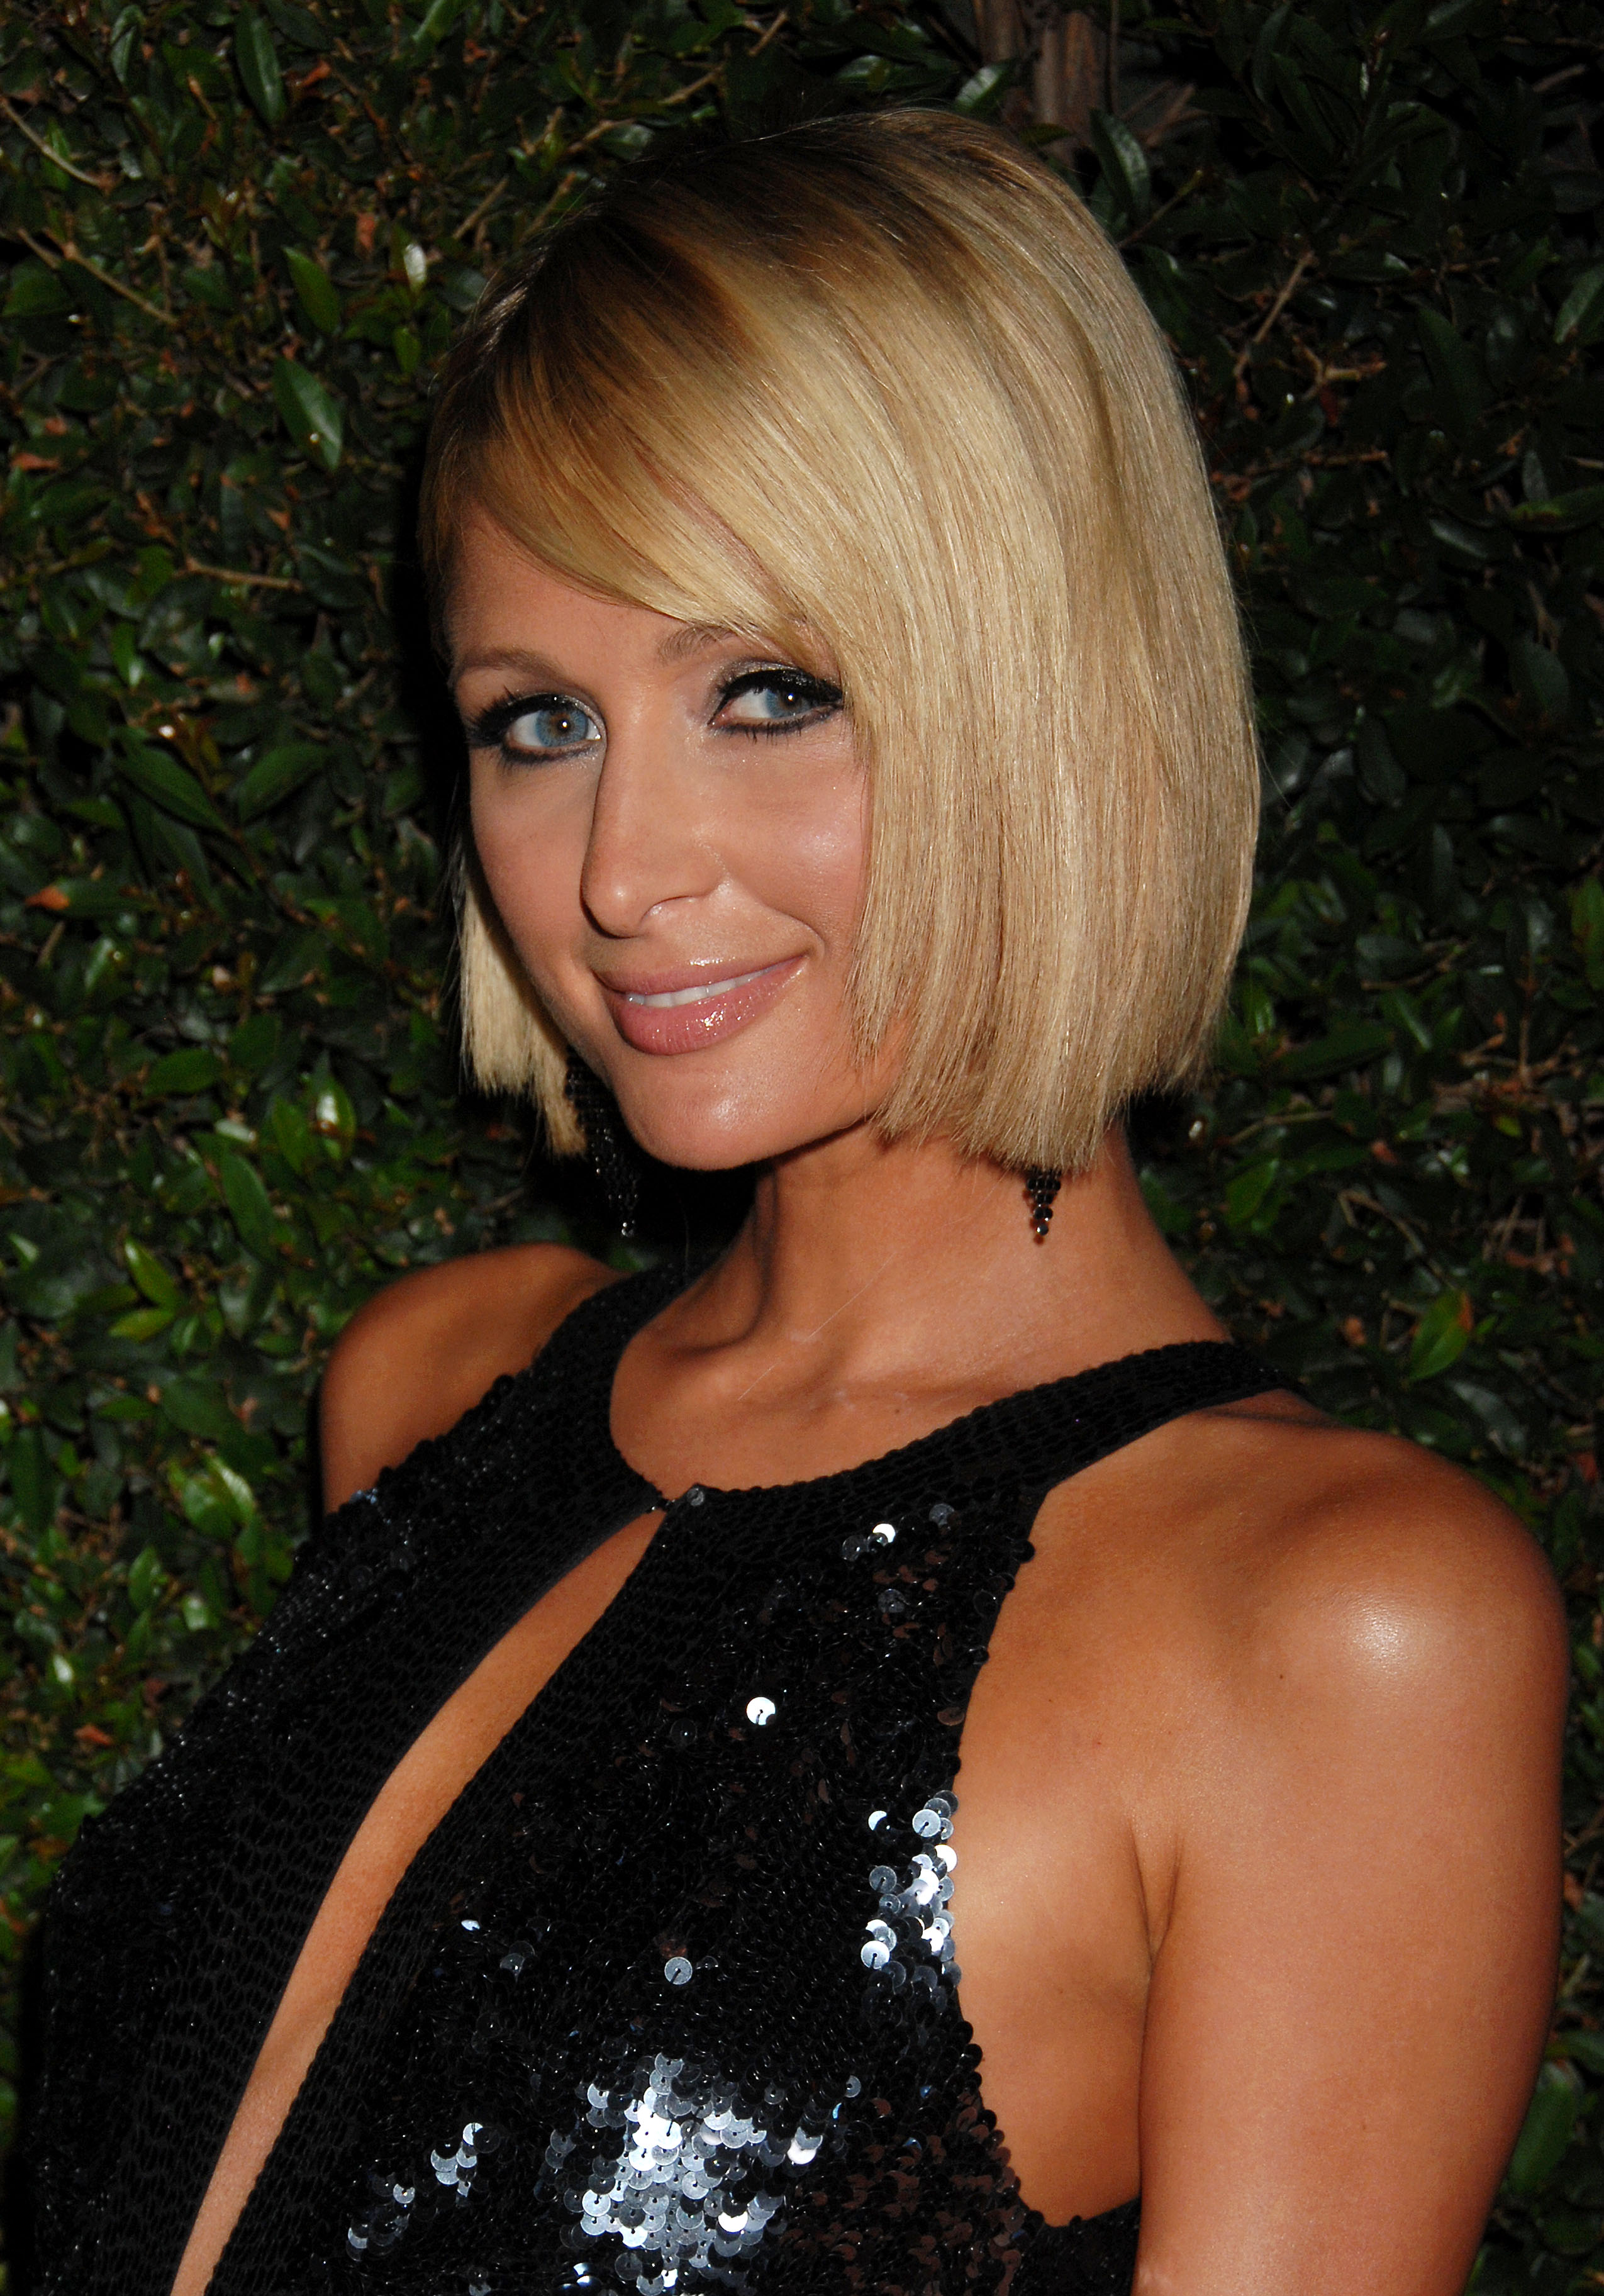 La sextape excitante de Paris Hilton - tukifcom